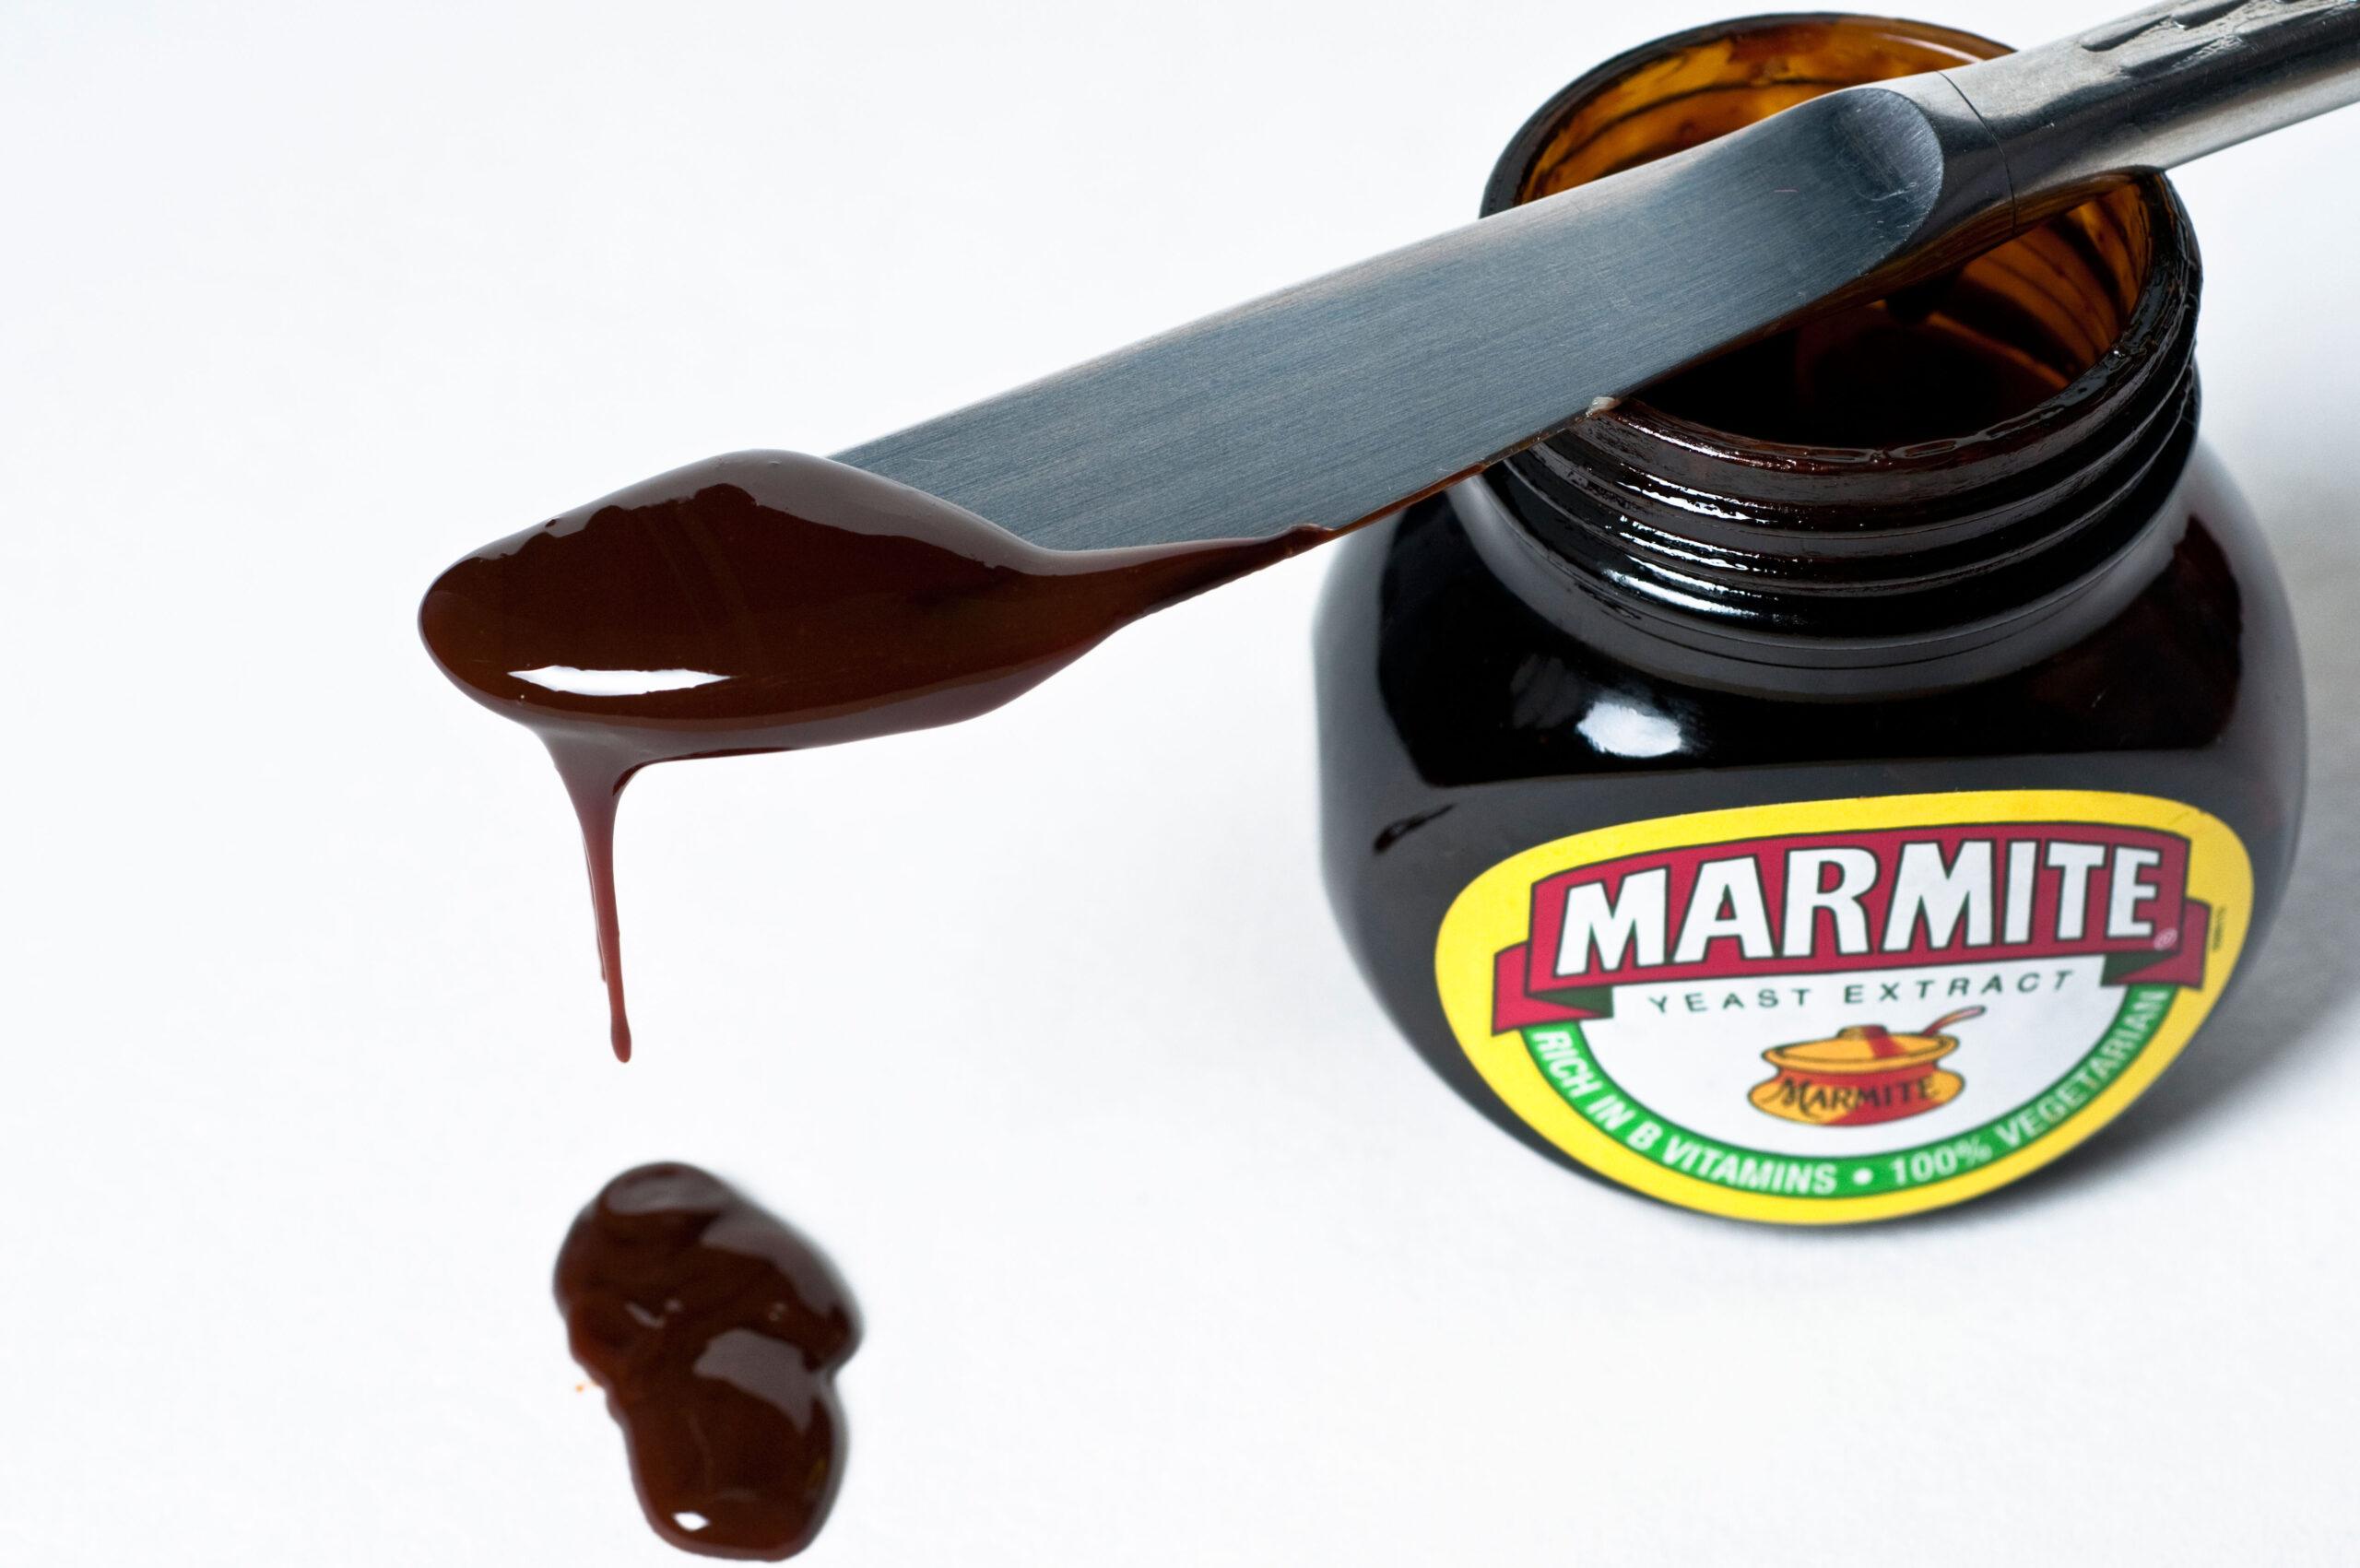 Marmite seasoning